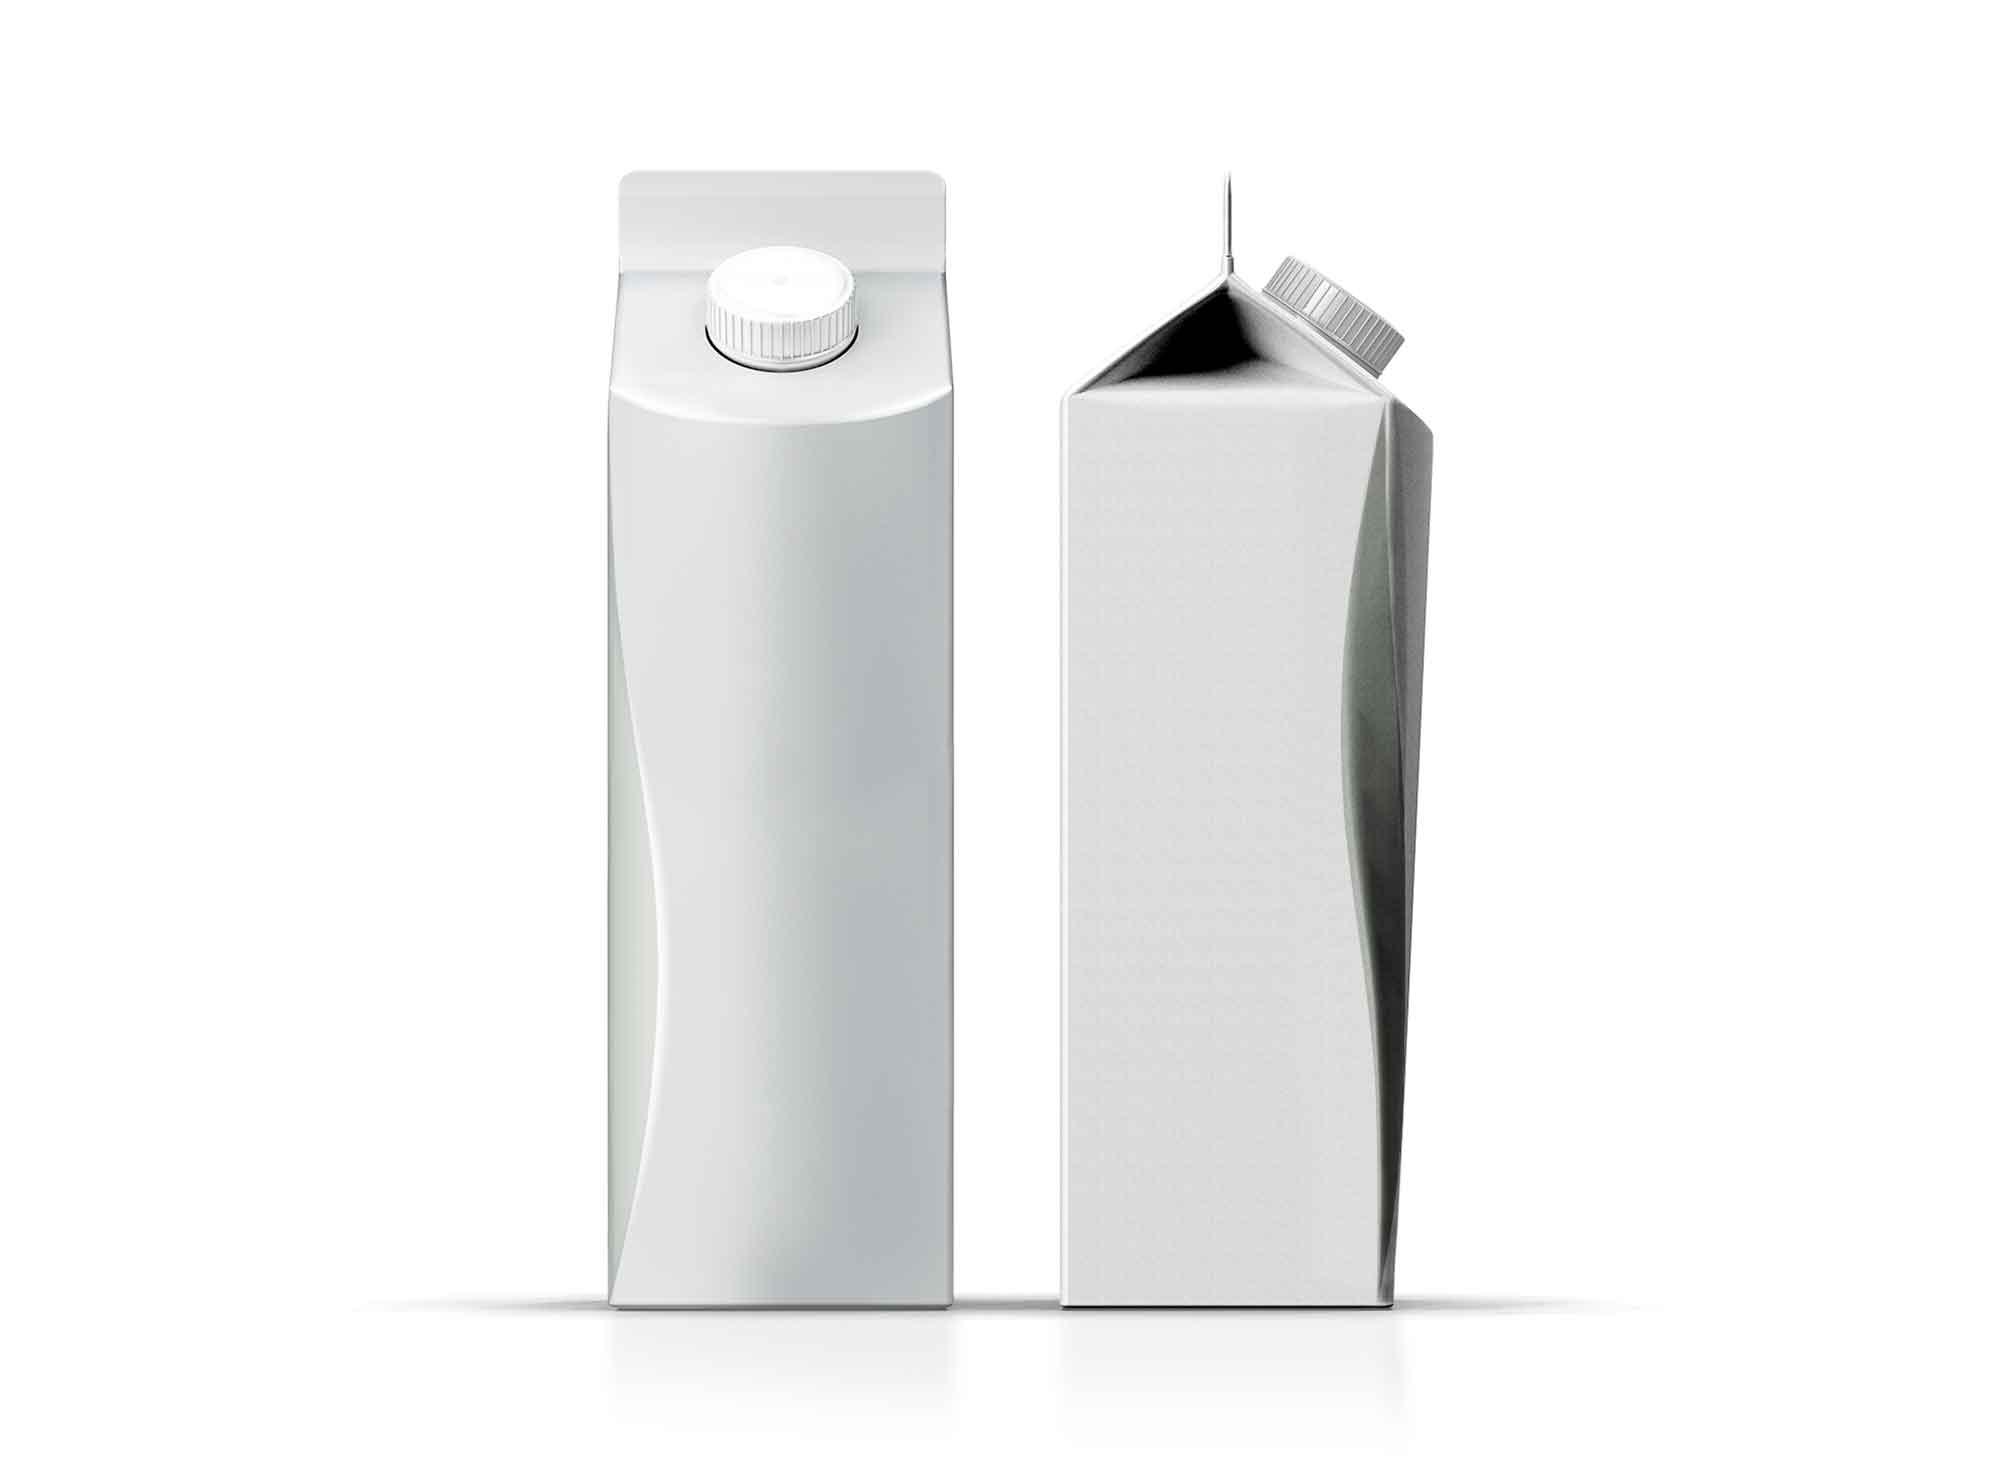 Carton Juice Box Mockup 3